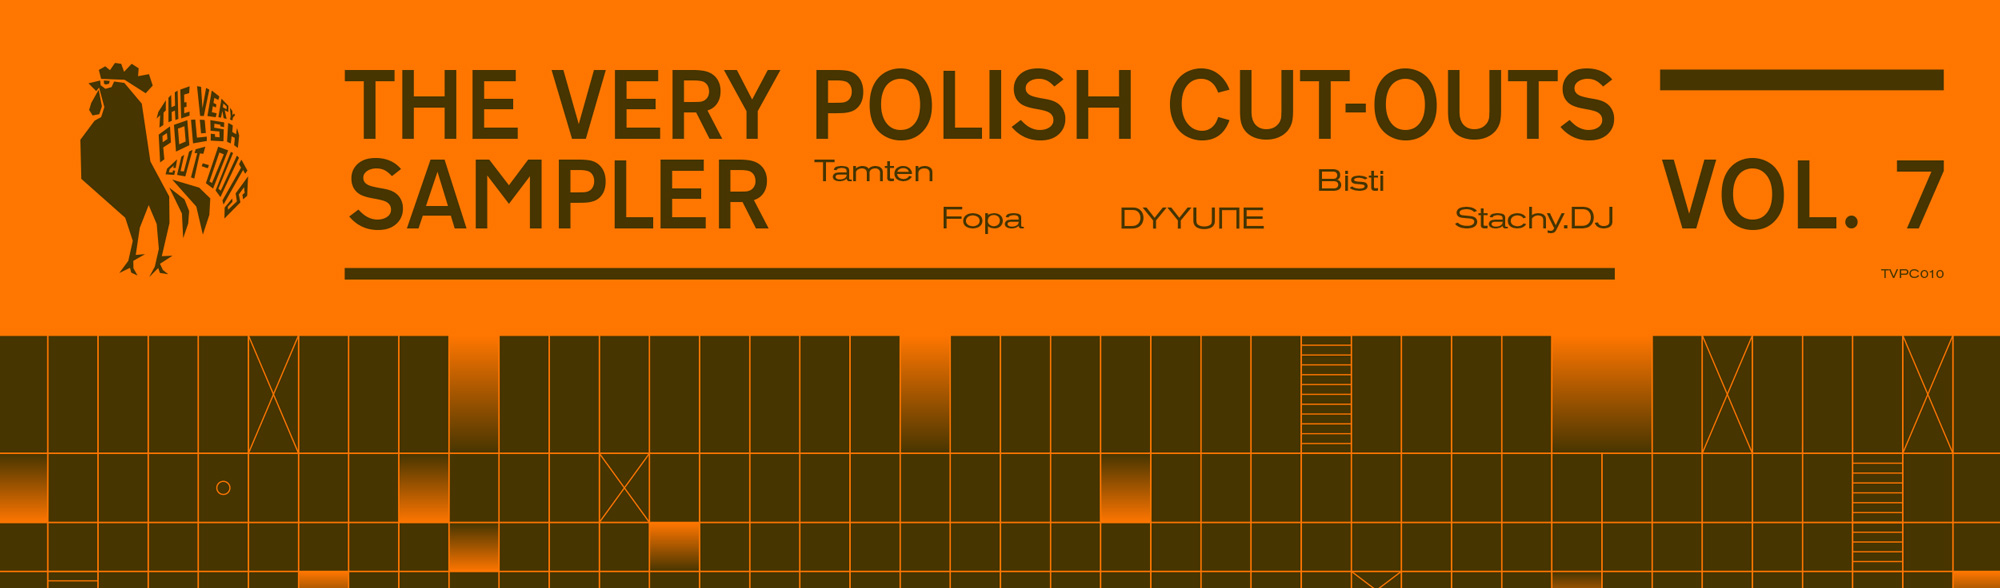 Dyyune / Bisti / Tamten / Fopa / Stachy.DJ – The Very Polish Cut-Outs Sampler Vol. 7